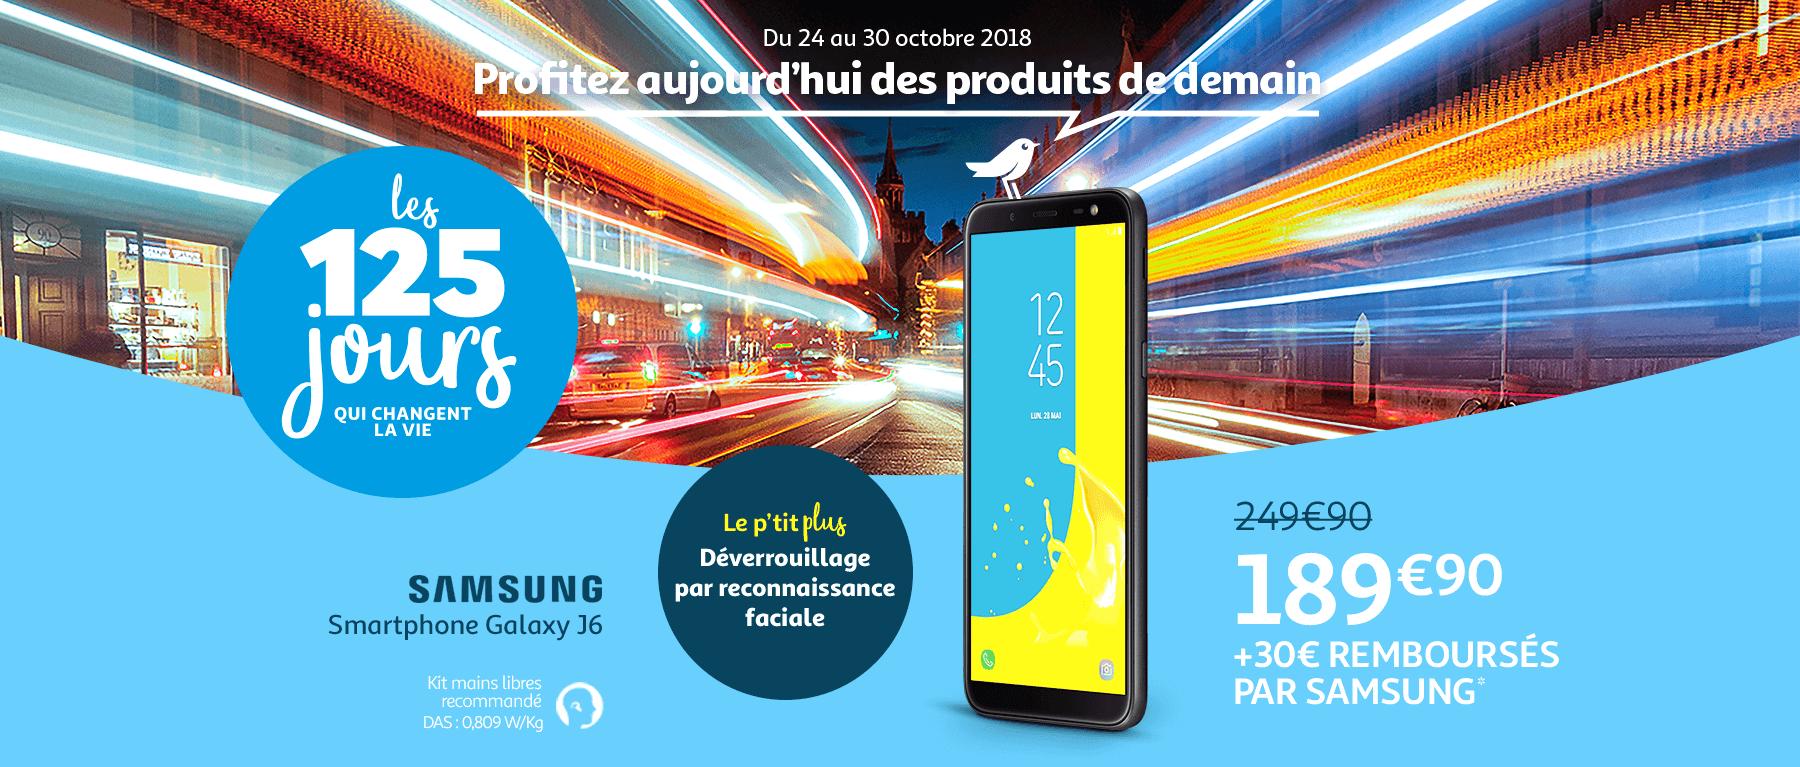 Jusqu'au 30 octobre, profitez des produits de demain. Samsung Galaxy J6 à 189€90